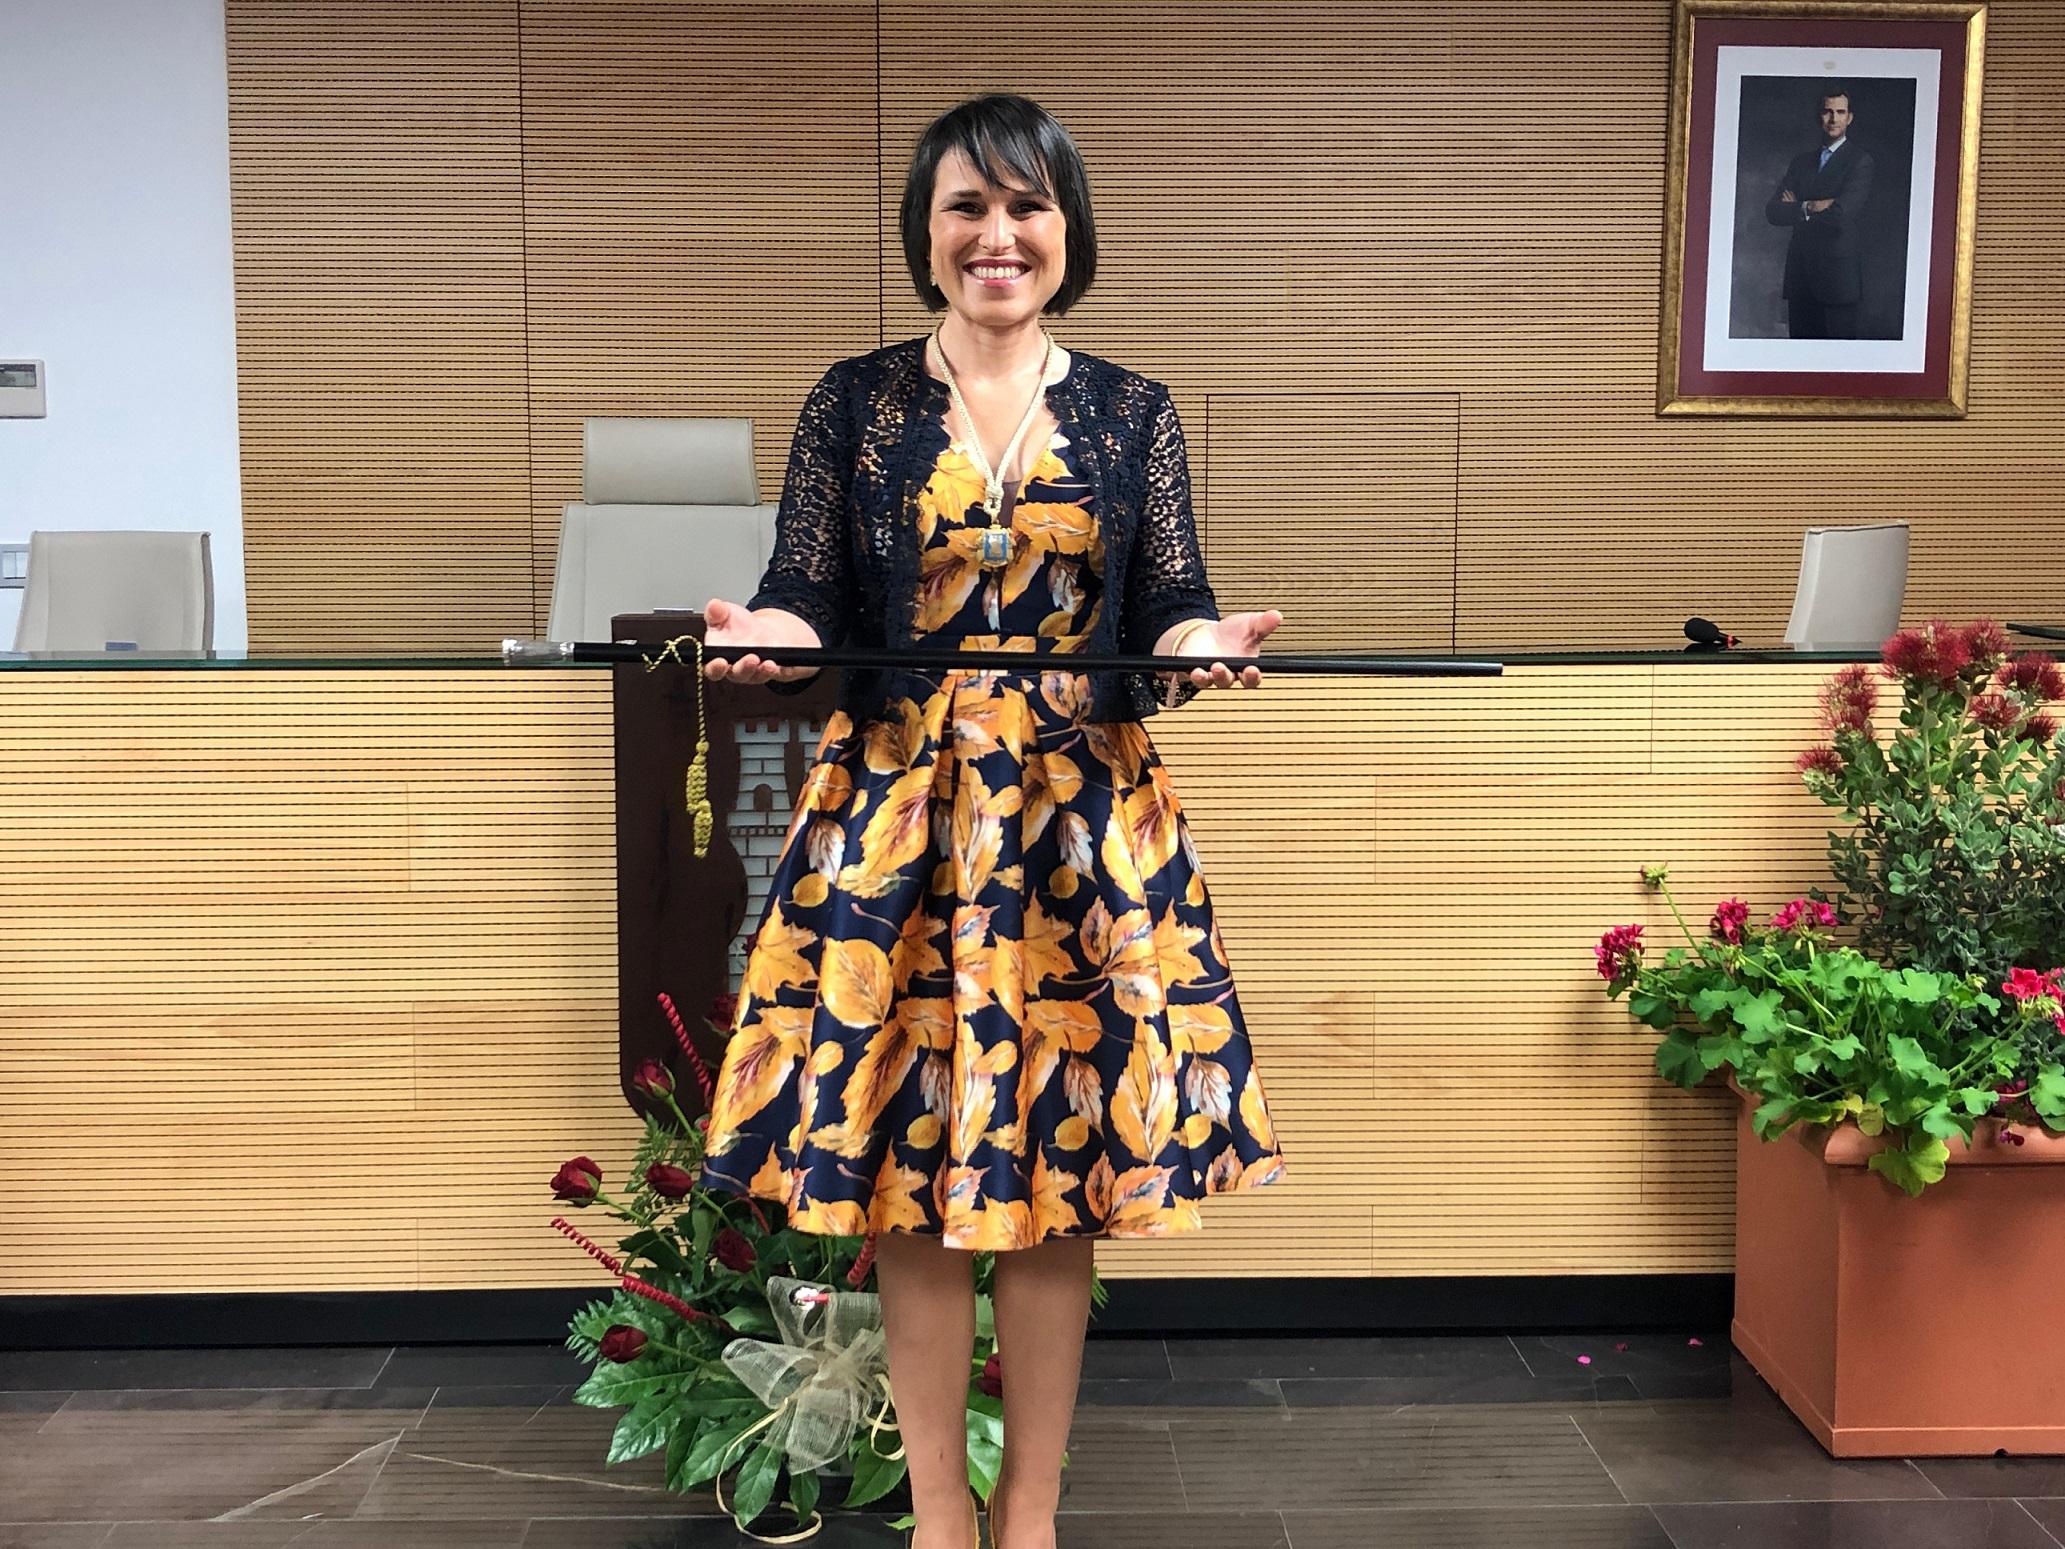 Entrevista a la alcaldesa de Almassora, Merche Galí